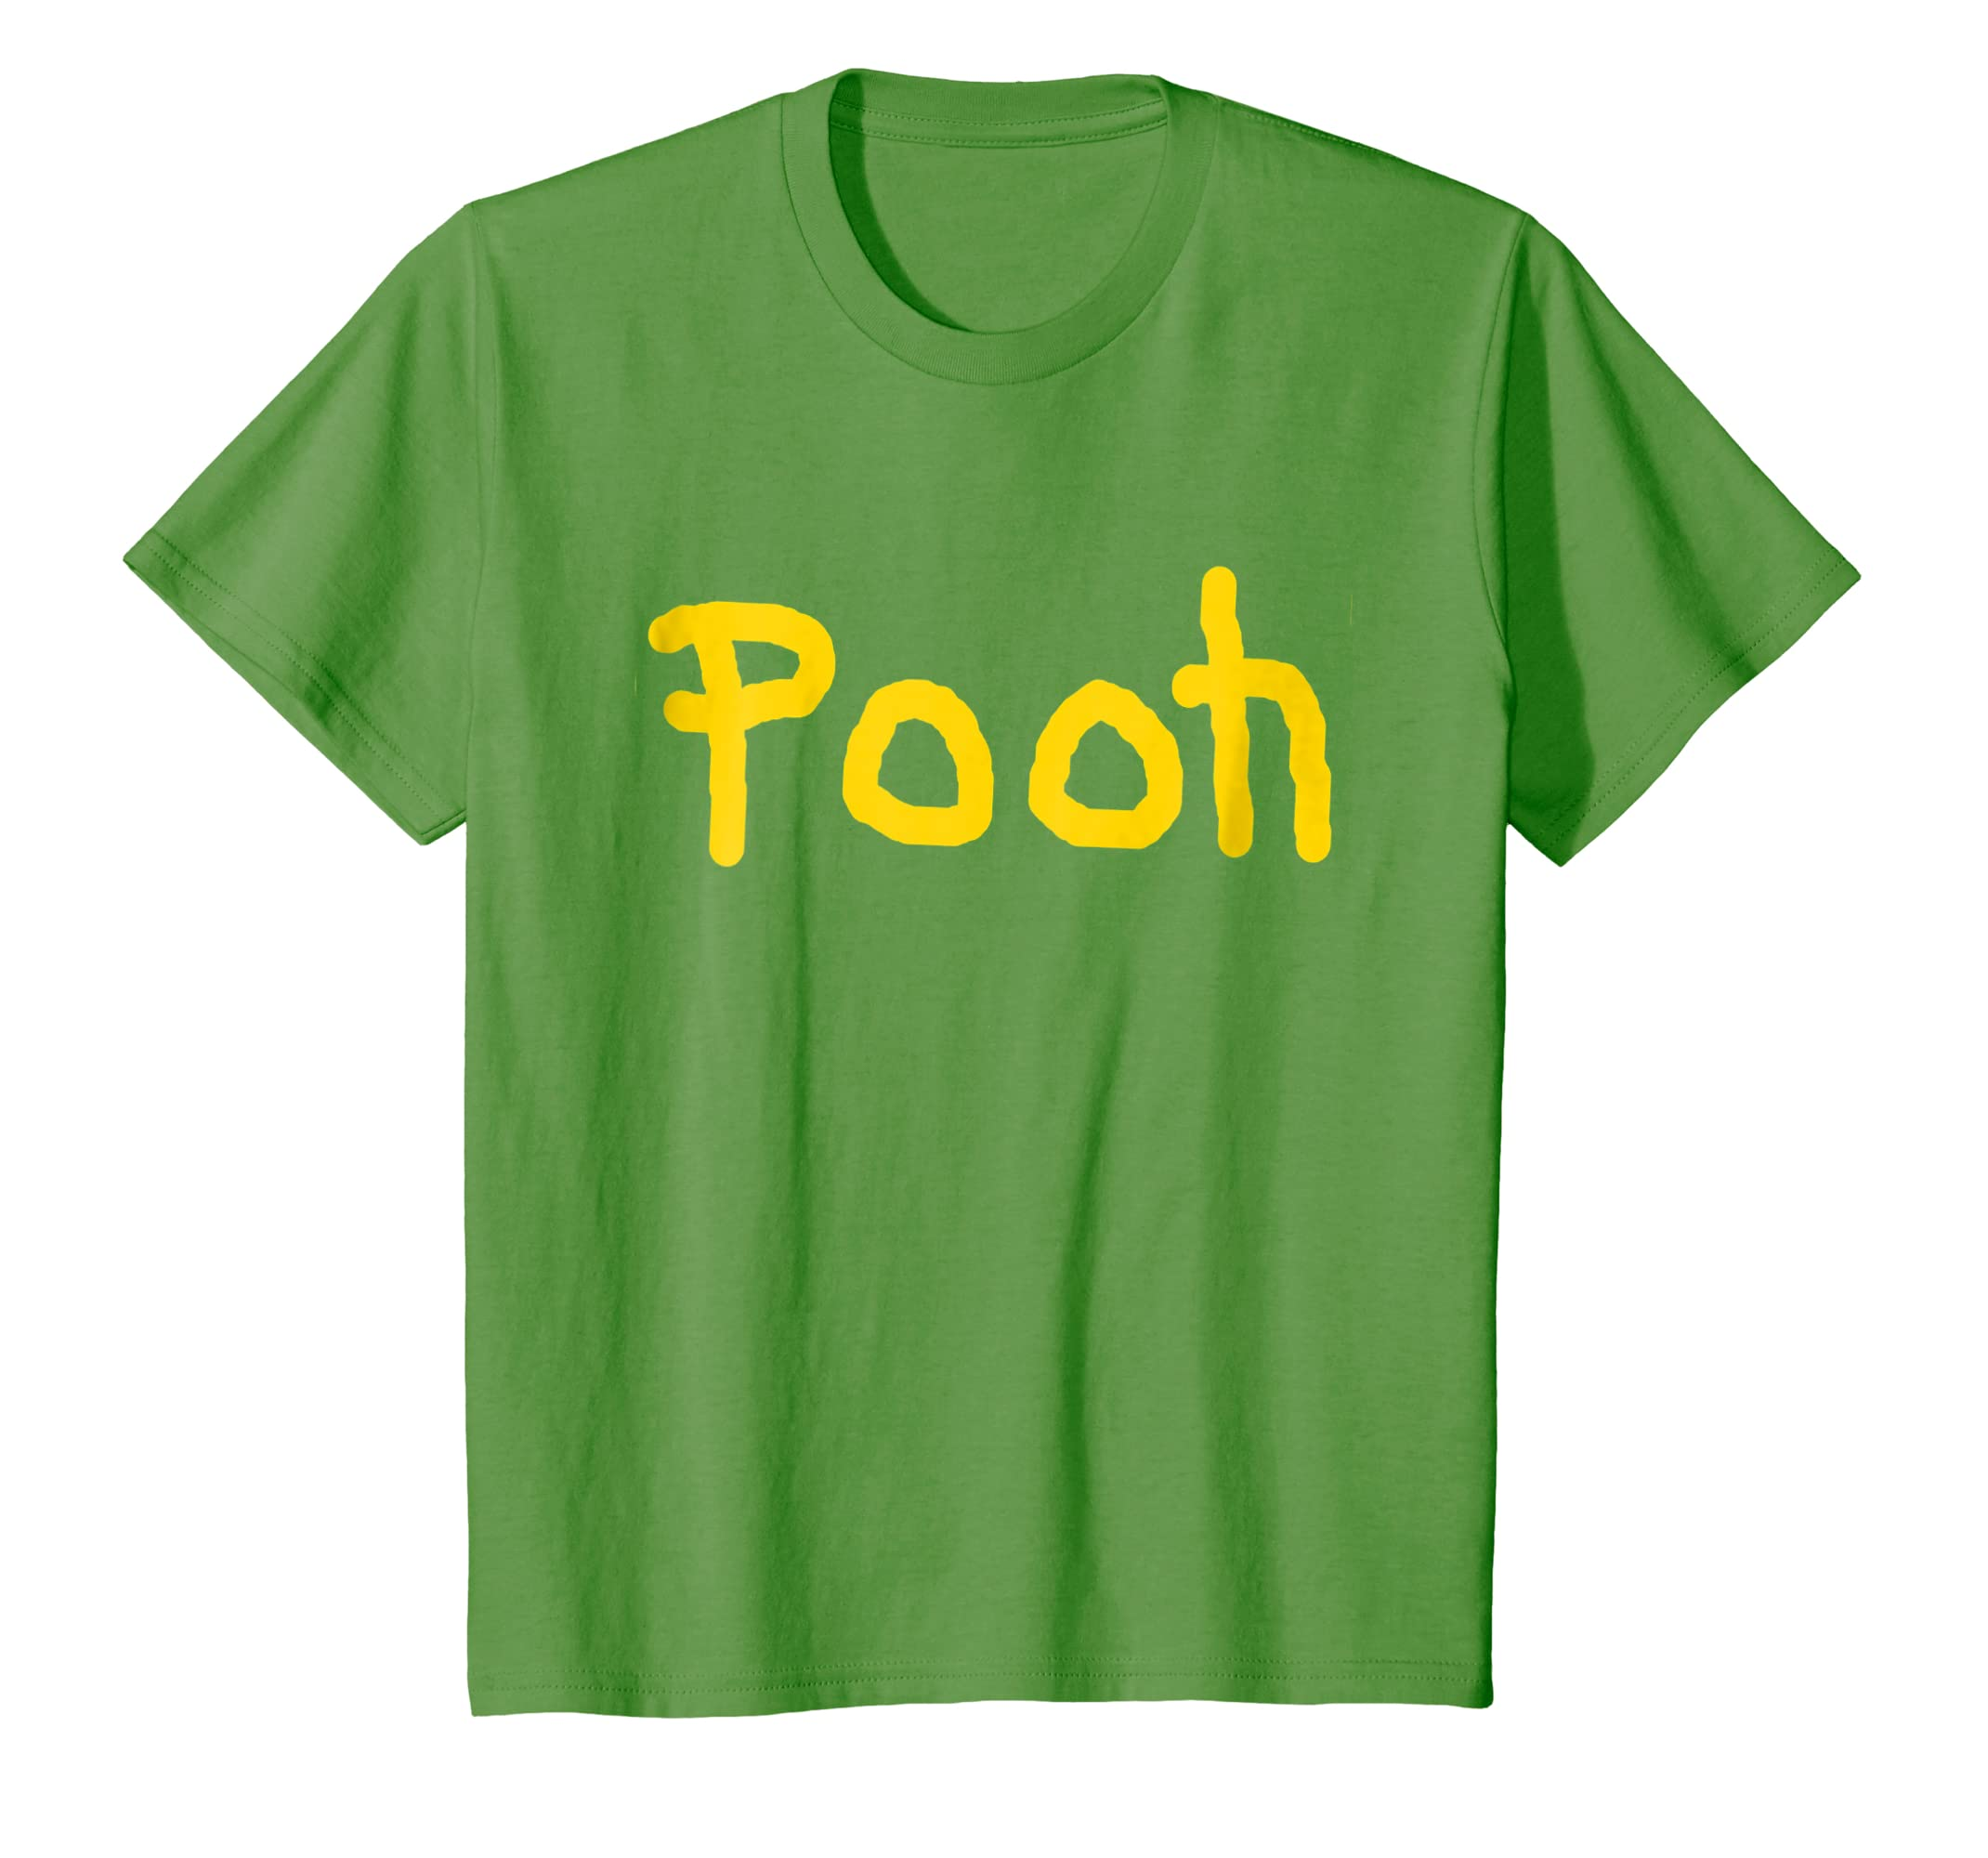 pooh shirt-Bawle